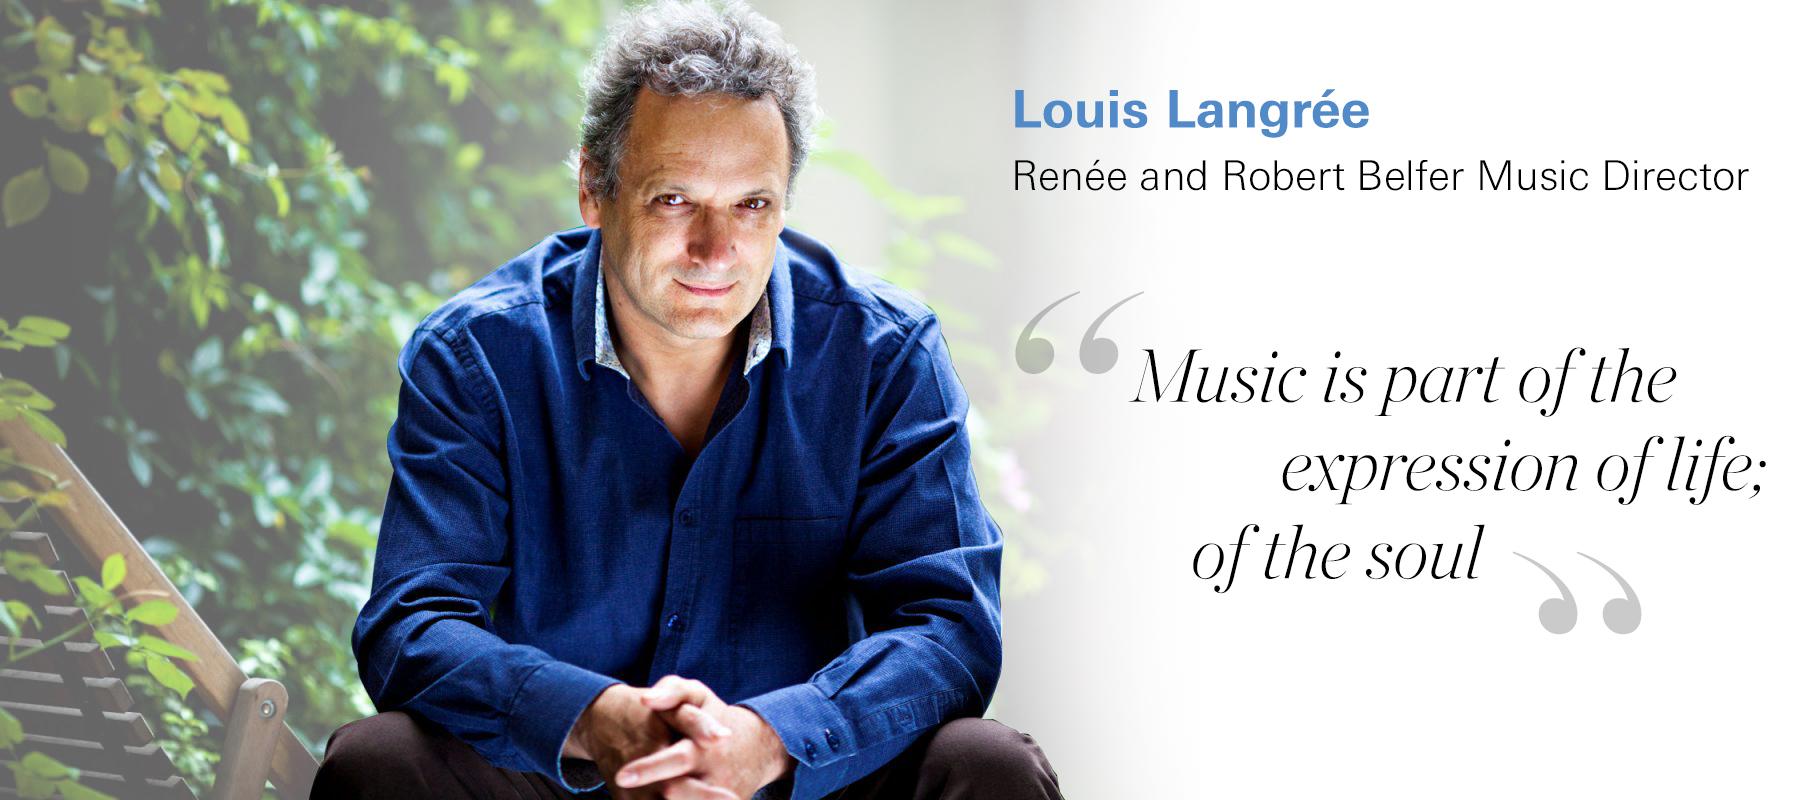 Louis Langrée